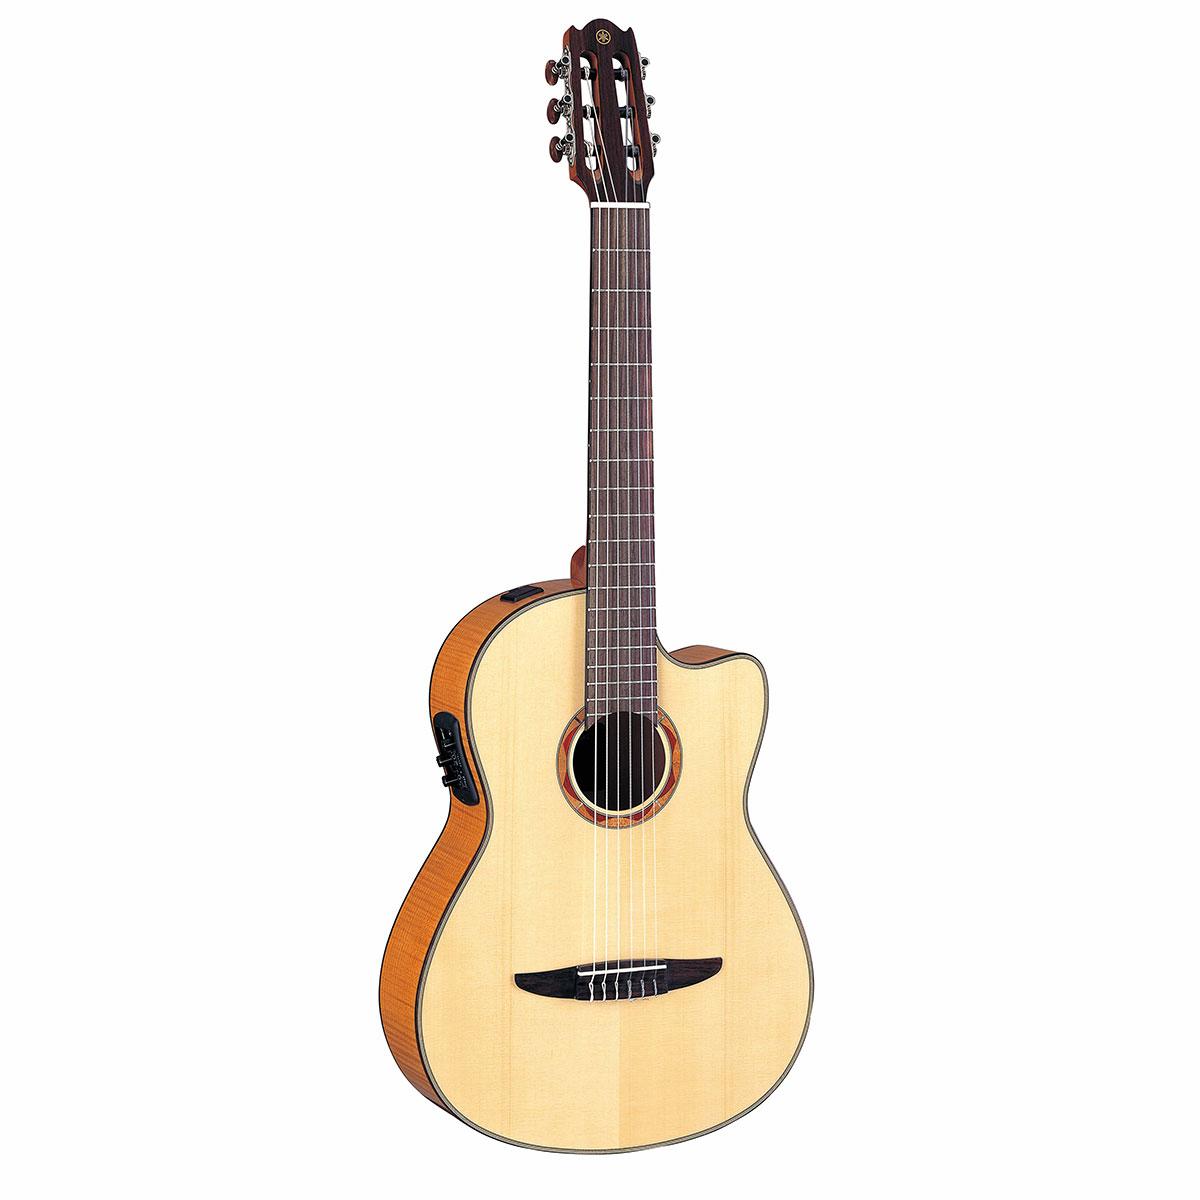 YAMAHA エレガットギター NCX900M / Natural